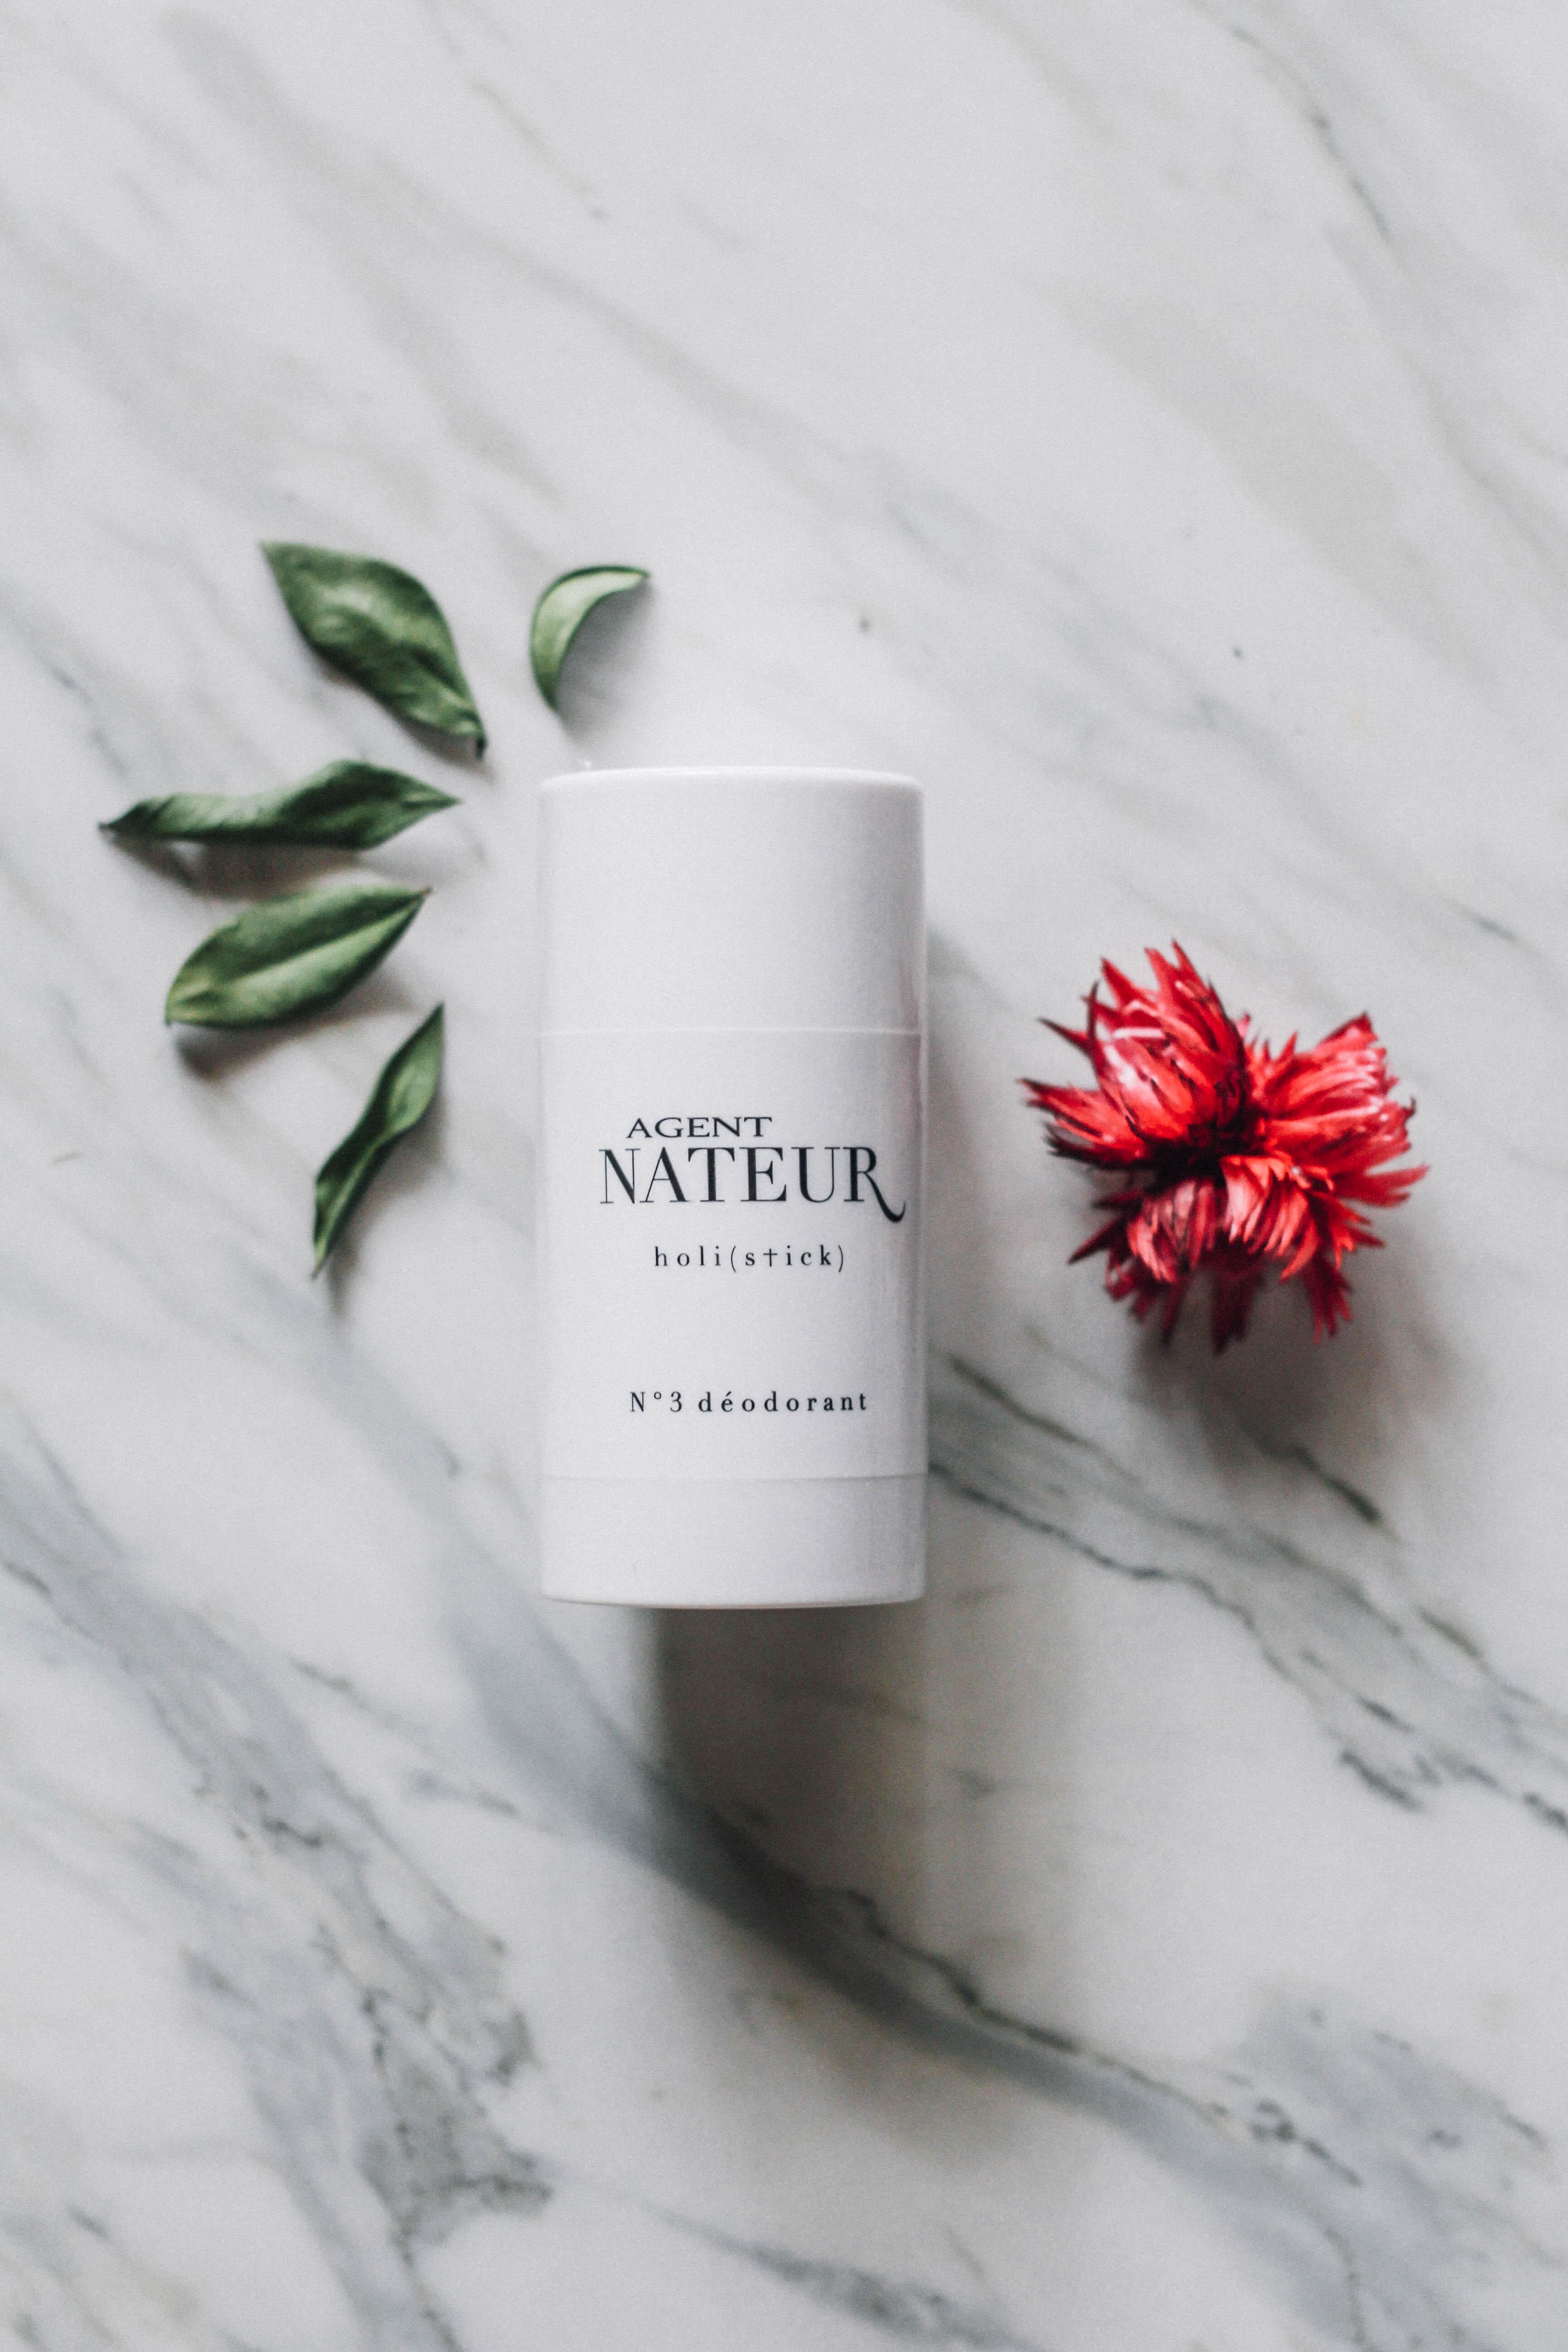 organic holi(stick) deodorant